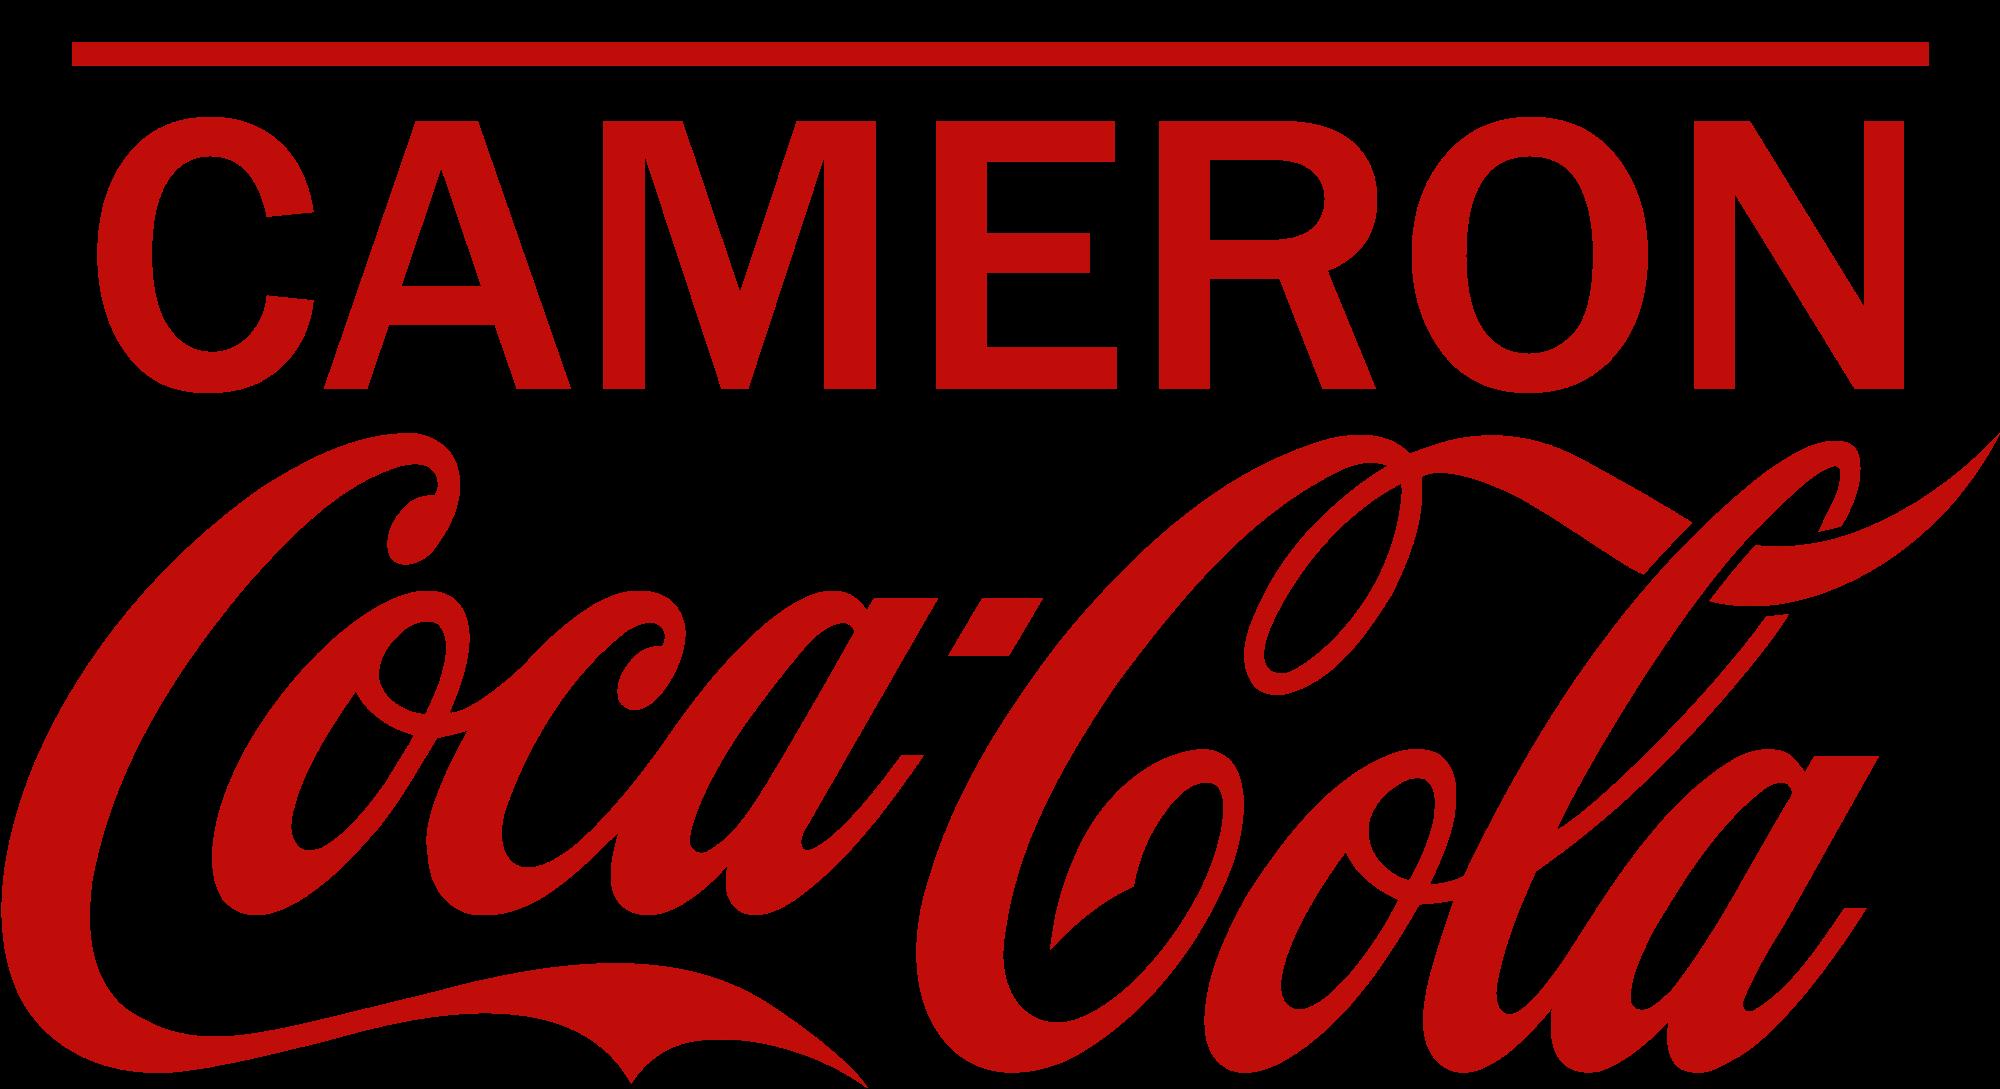 Coca Cola svg #10, Download drawings